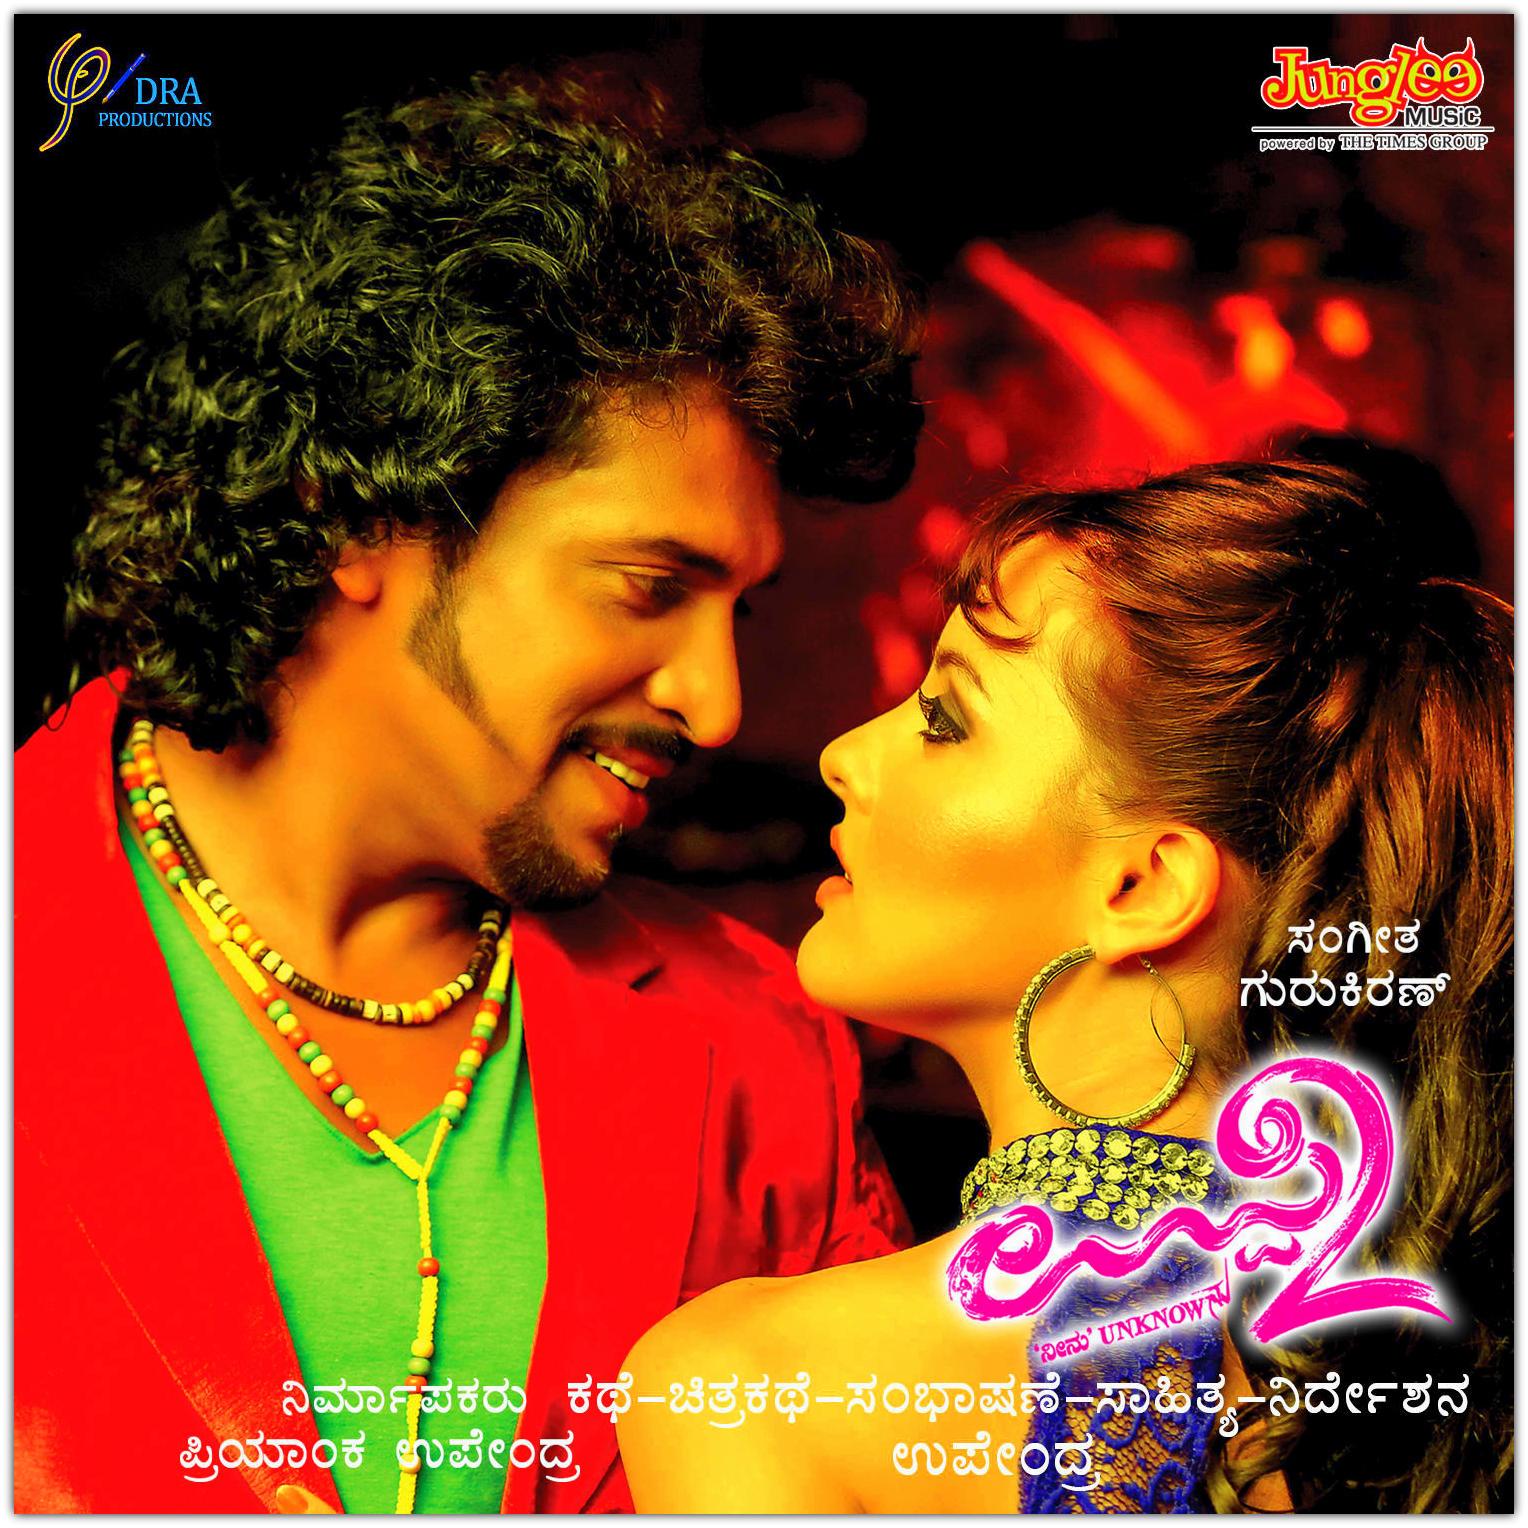 Upendra 2 telugu movie download utorrent free